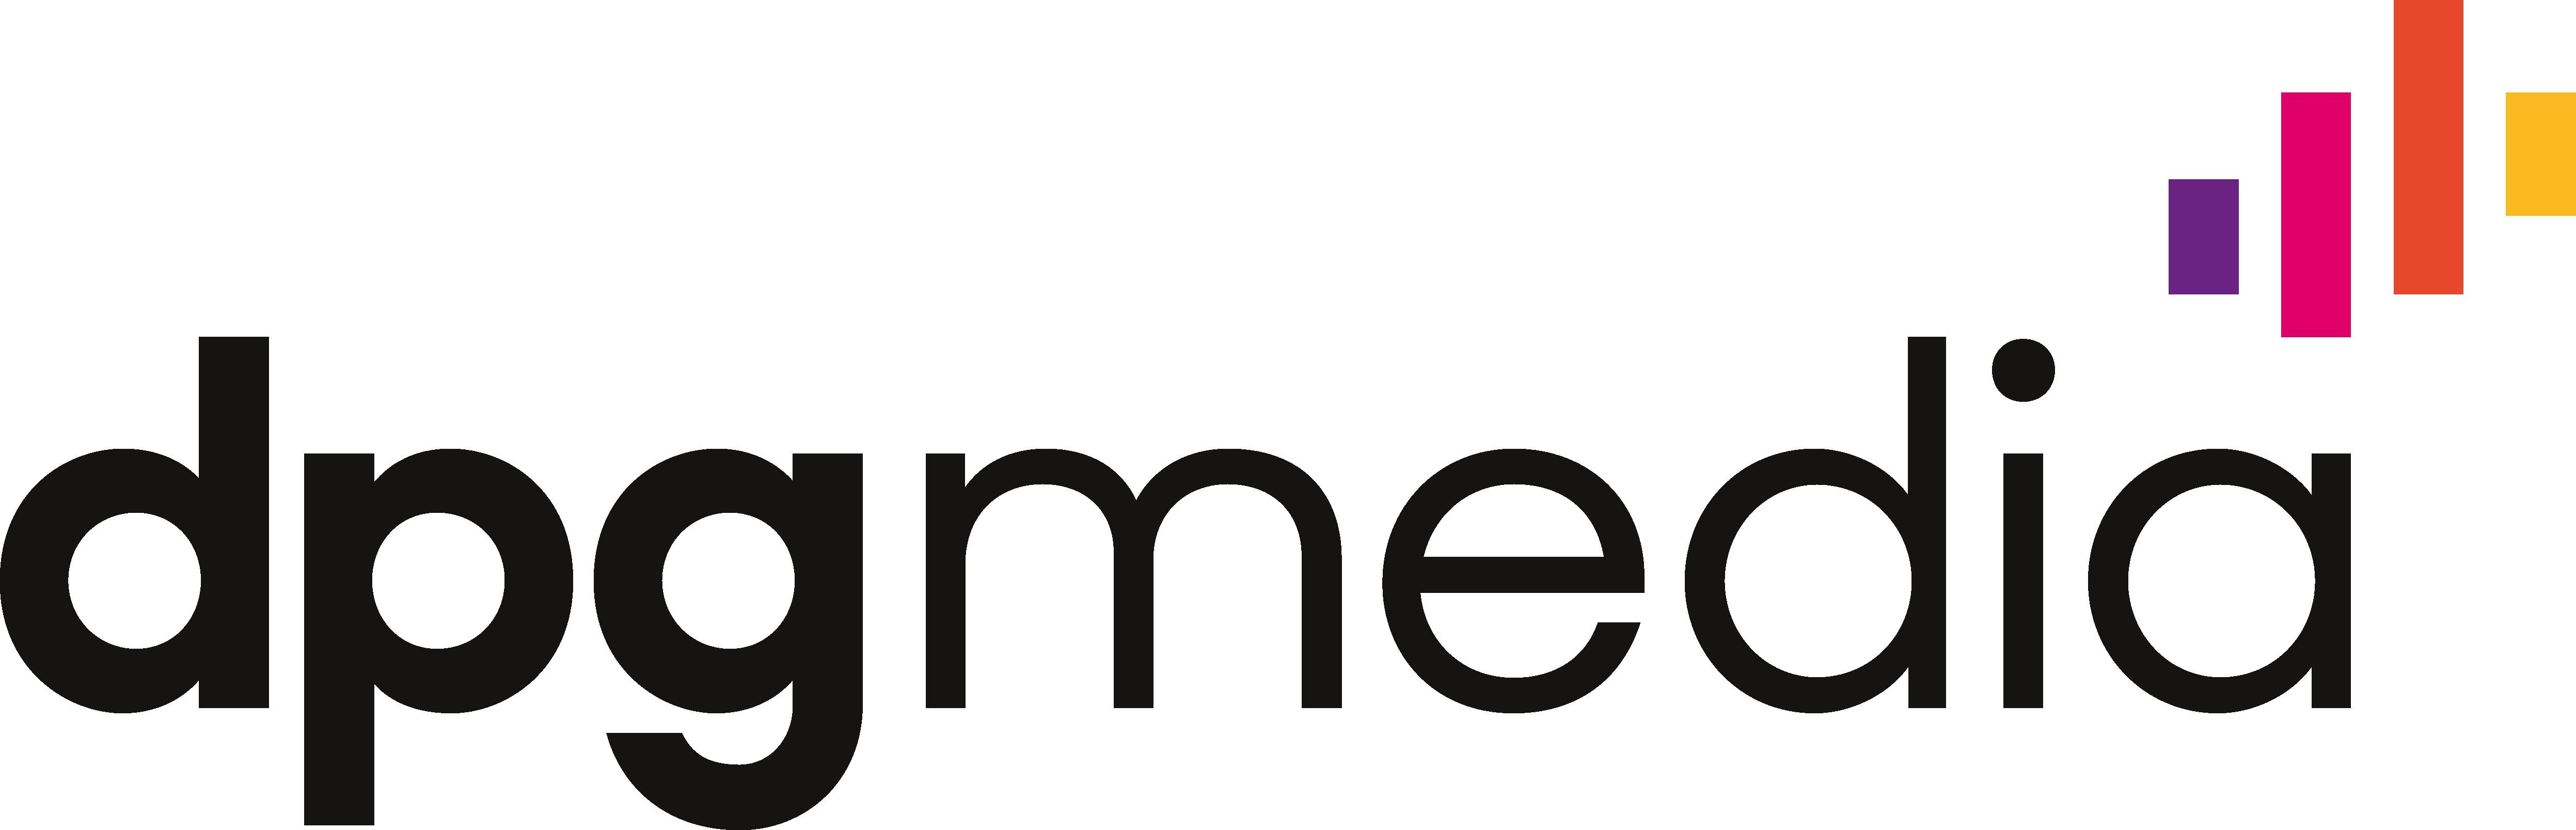 Dpgmedia Secondary Logo Cmyk 0001[2] Page 0